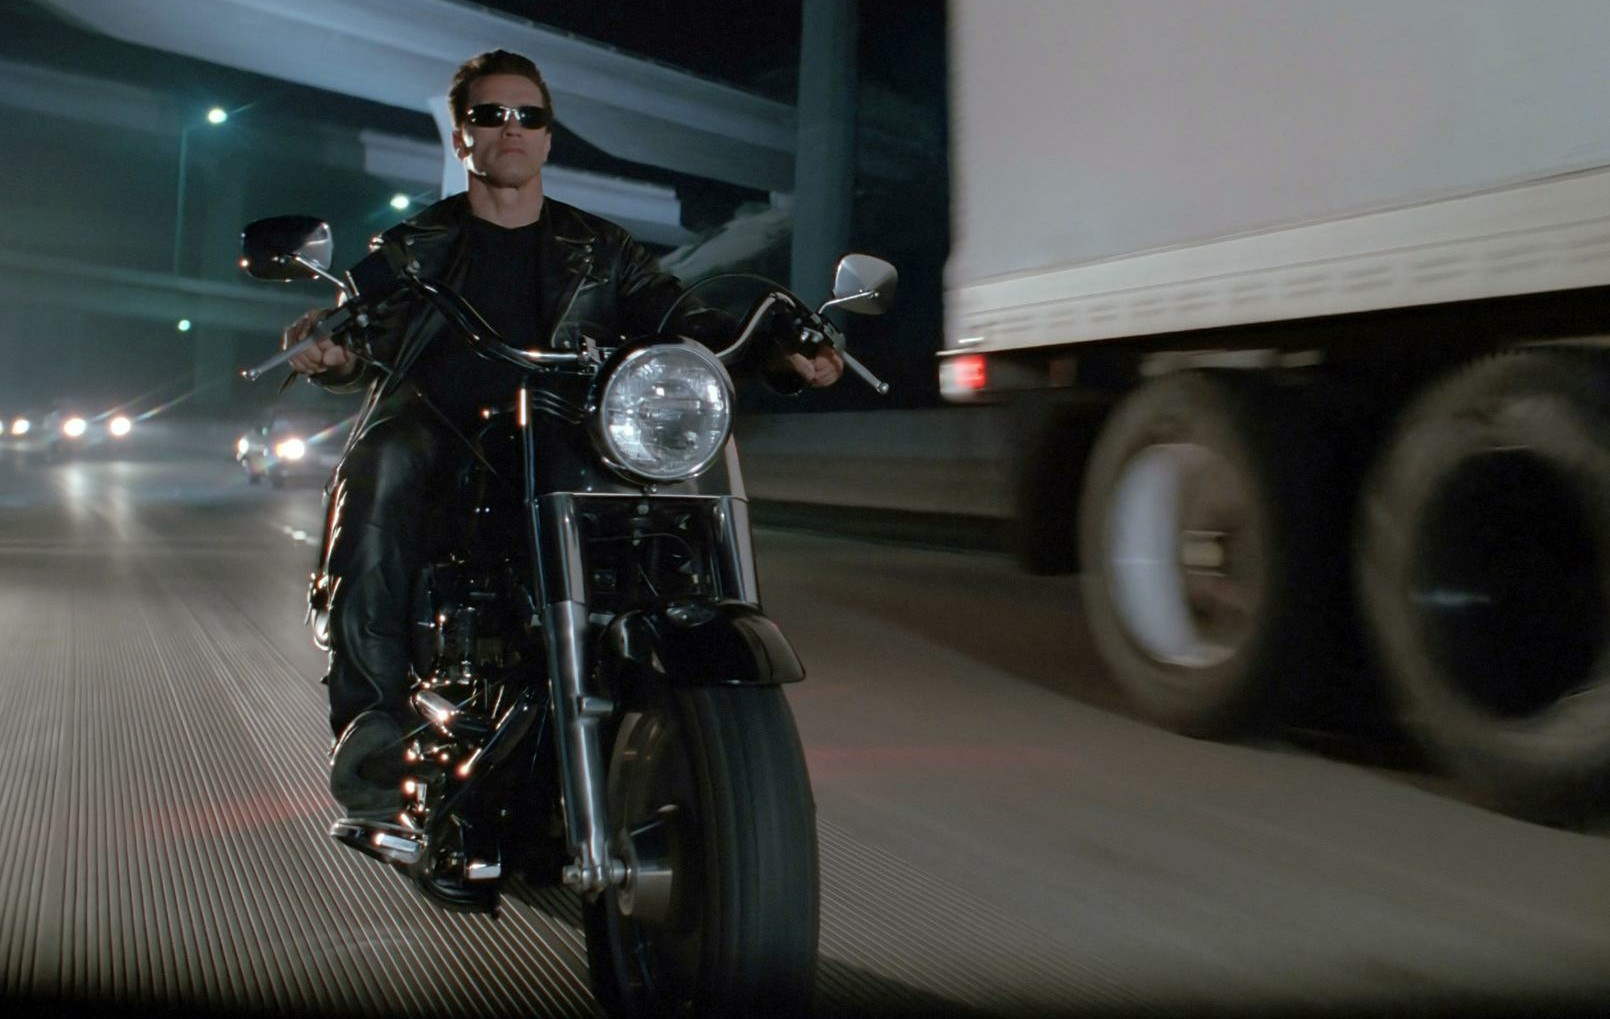 Arnold Schwarzenegger's Terminator 2 Bike Sold For N181m And Jacket For N8.7m